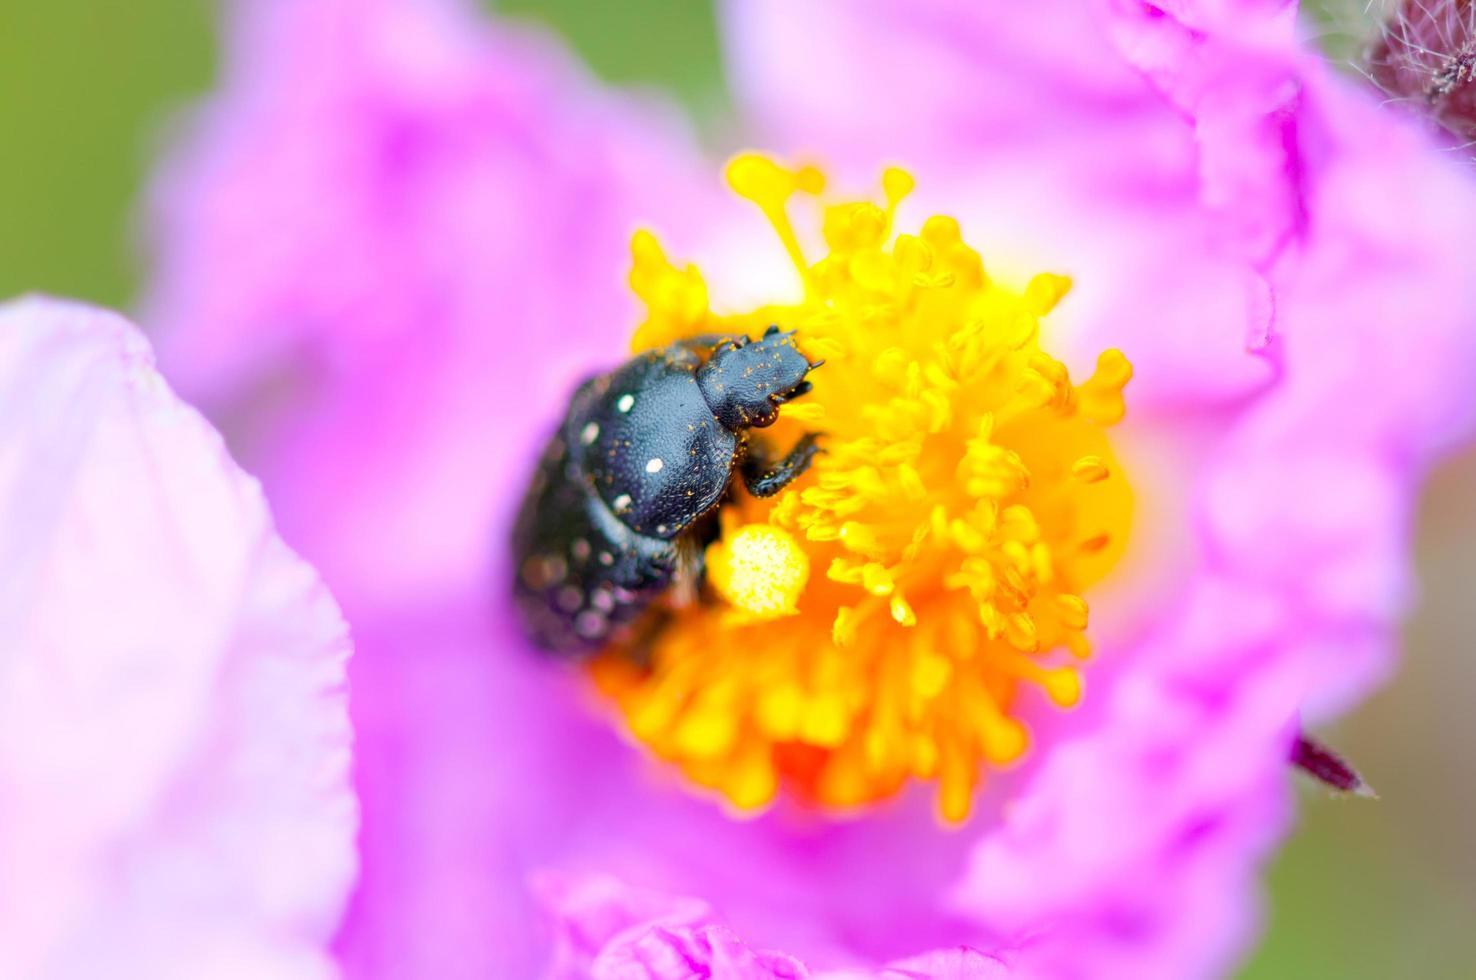 svart bugg på en rosa blomma foto